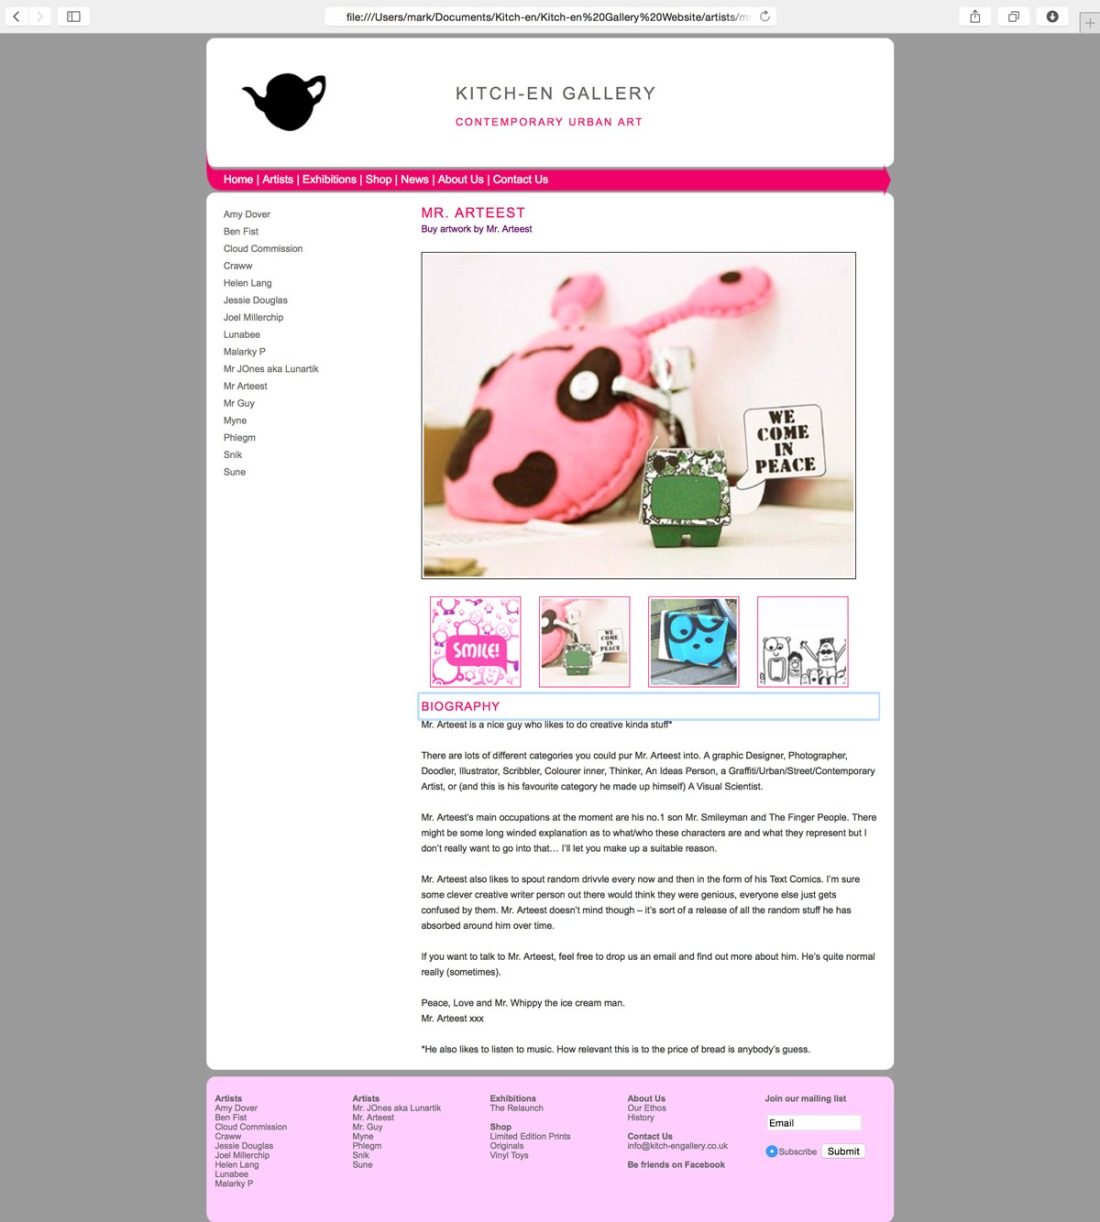 Kitch-en Gallery Website Design and Build